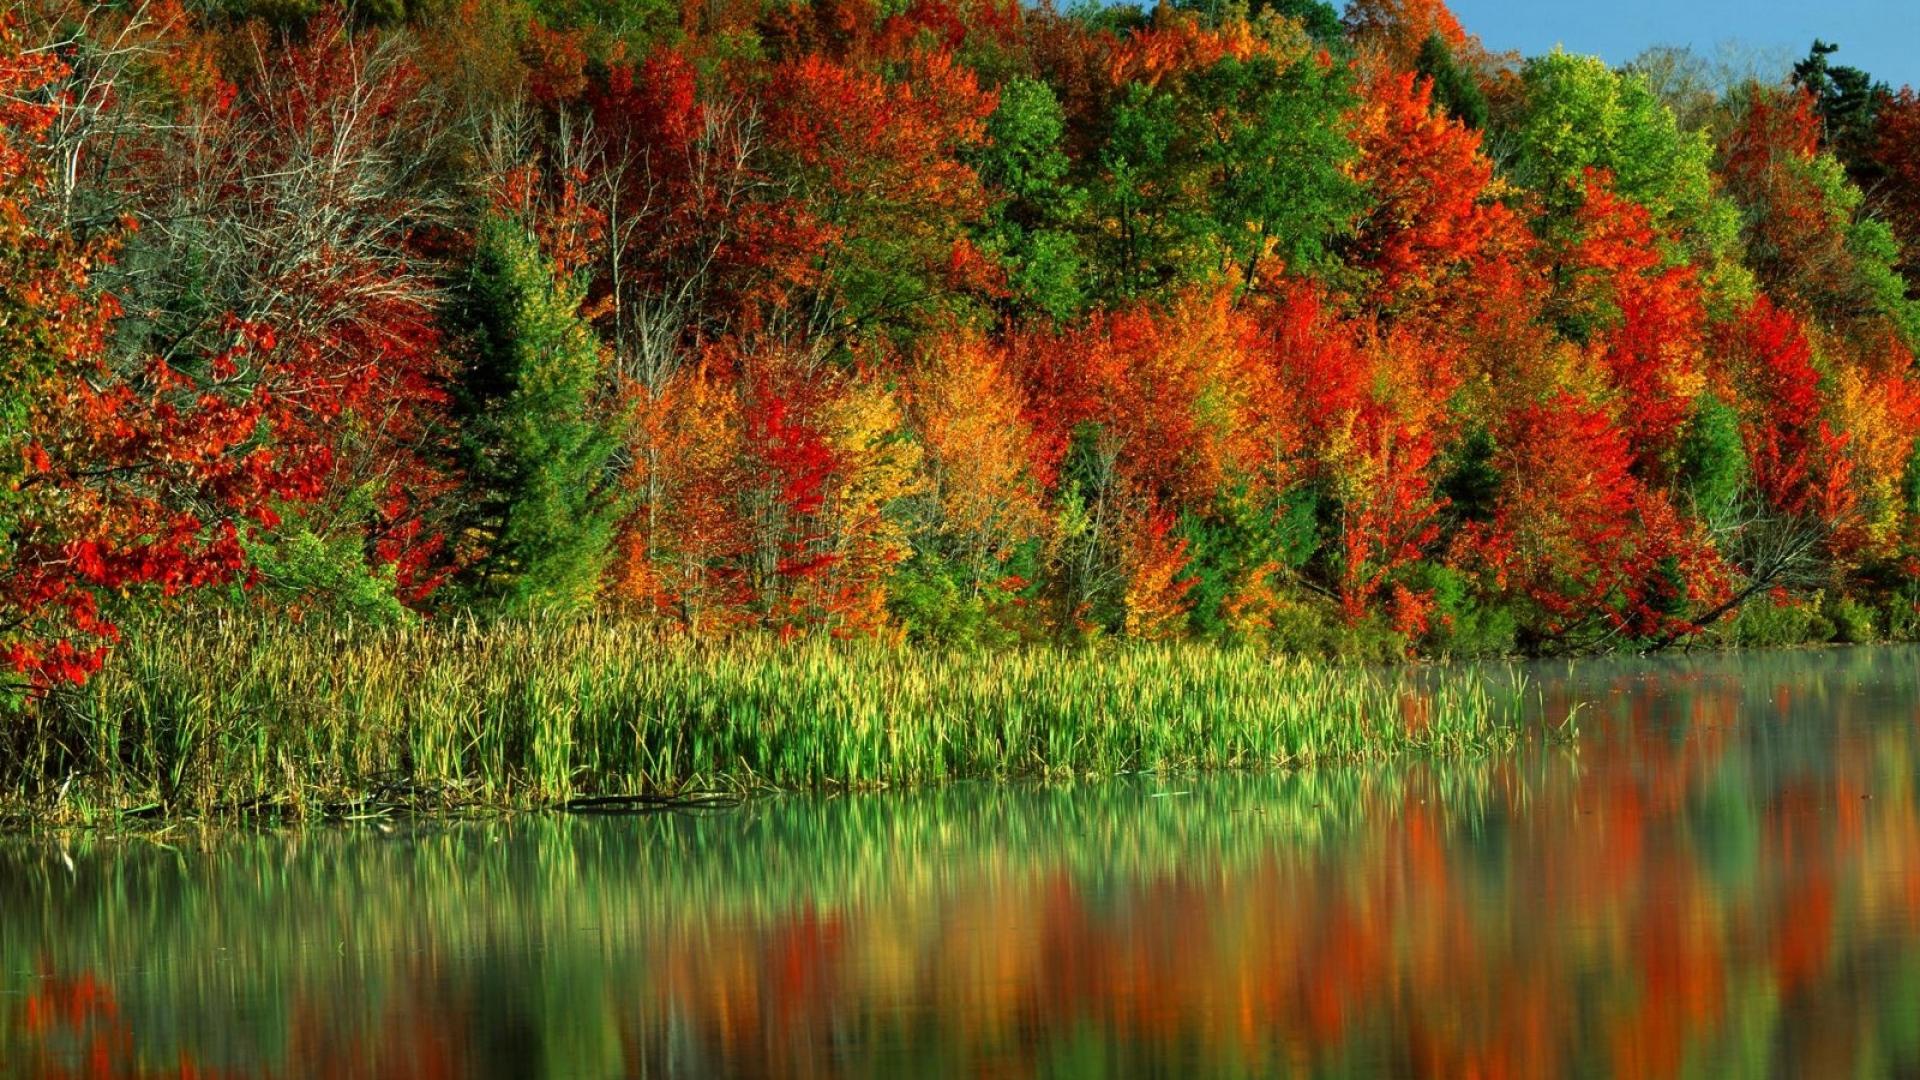 Download Wallpaper 1920x1080 autumn, trees, paints, leaves, multi ...